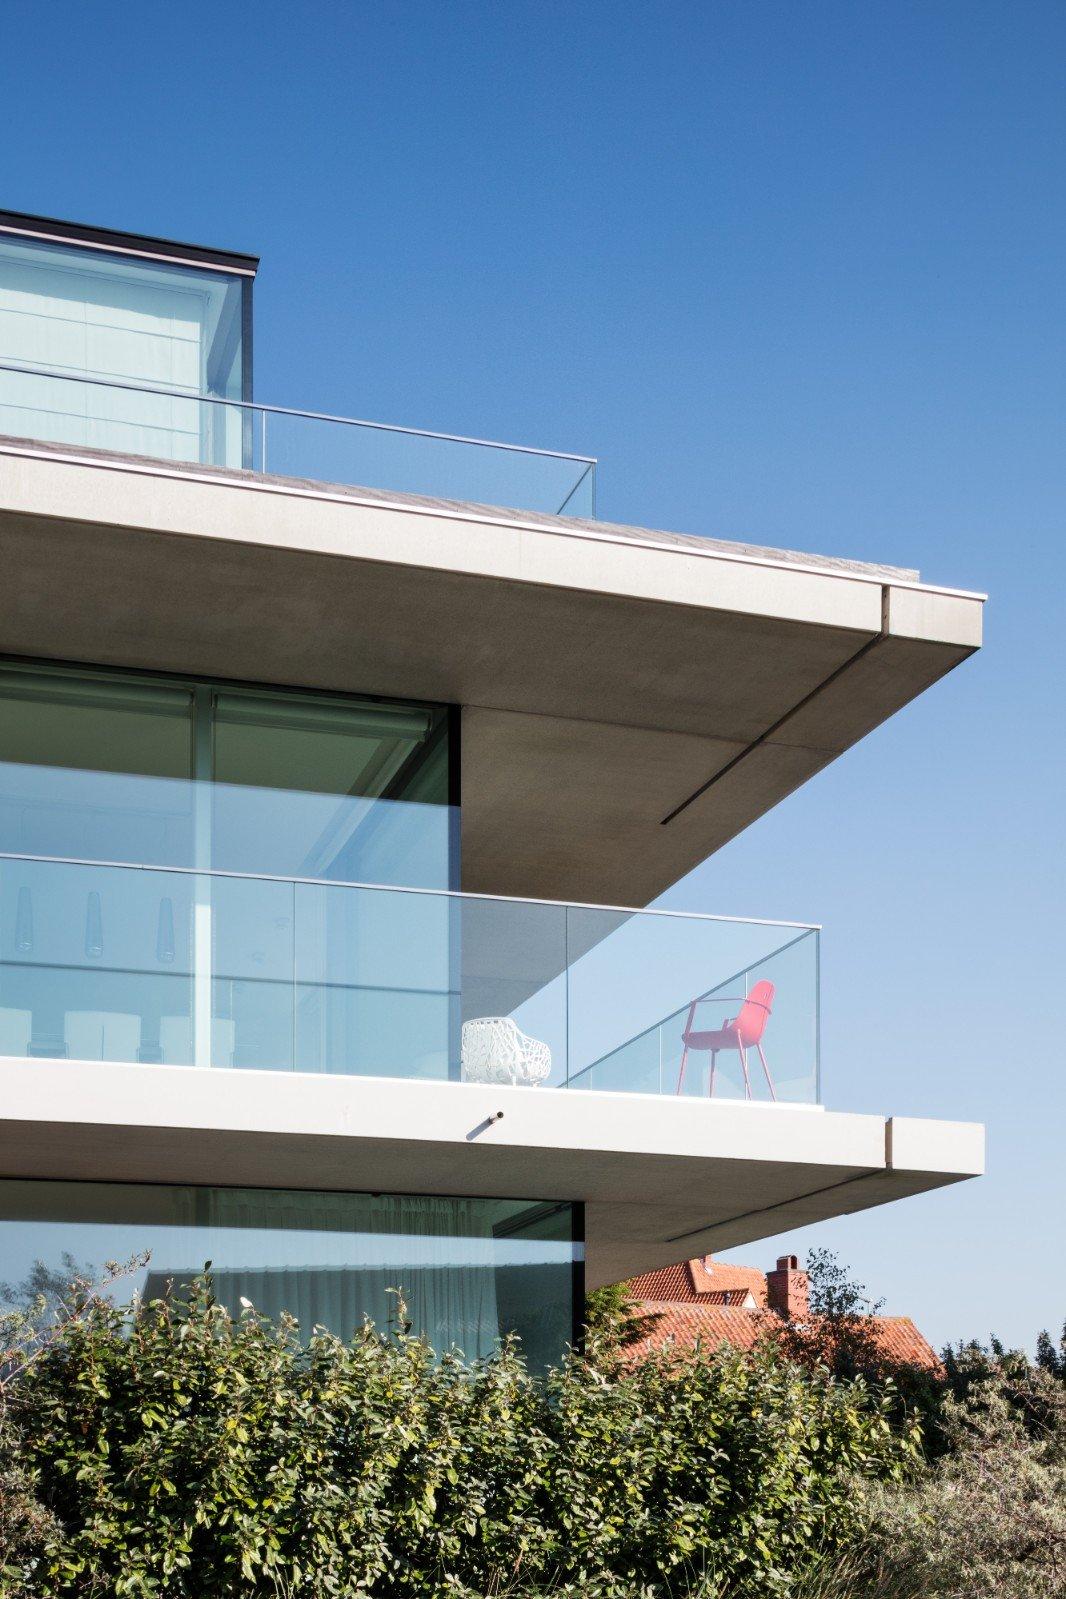 Rietveldprojects.be-Twins-Gropius-Breuer-appartement-design-architectuur-kust9.jpg